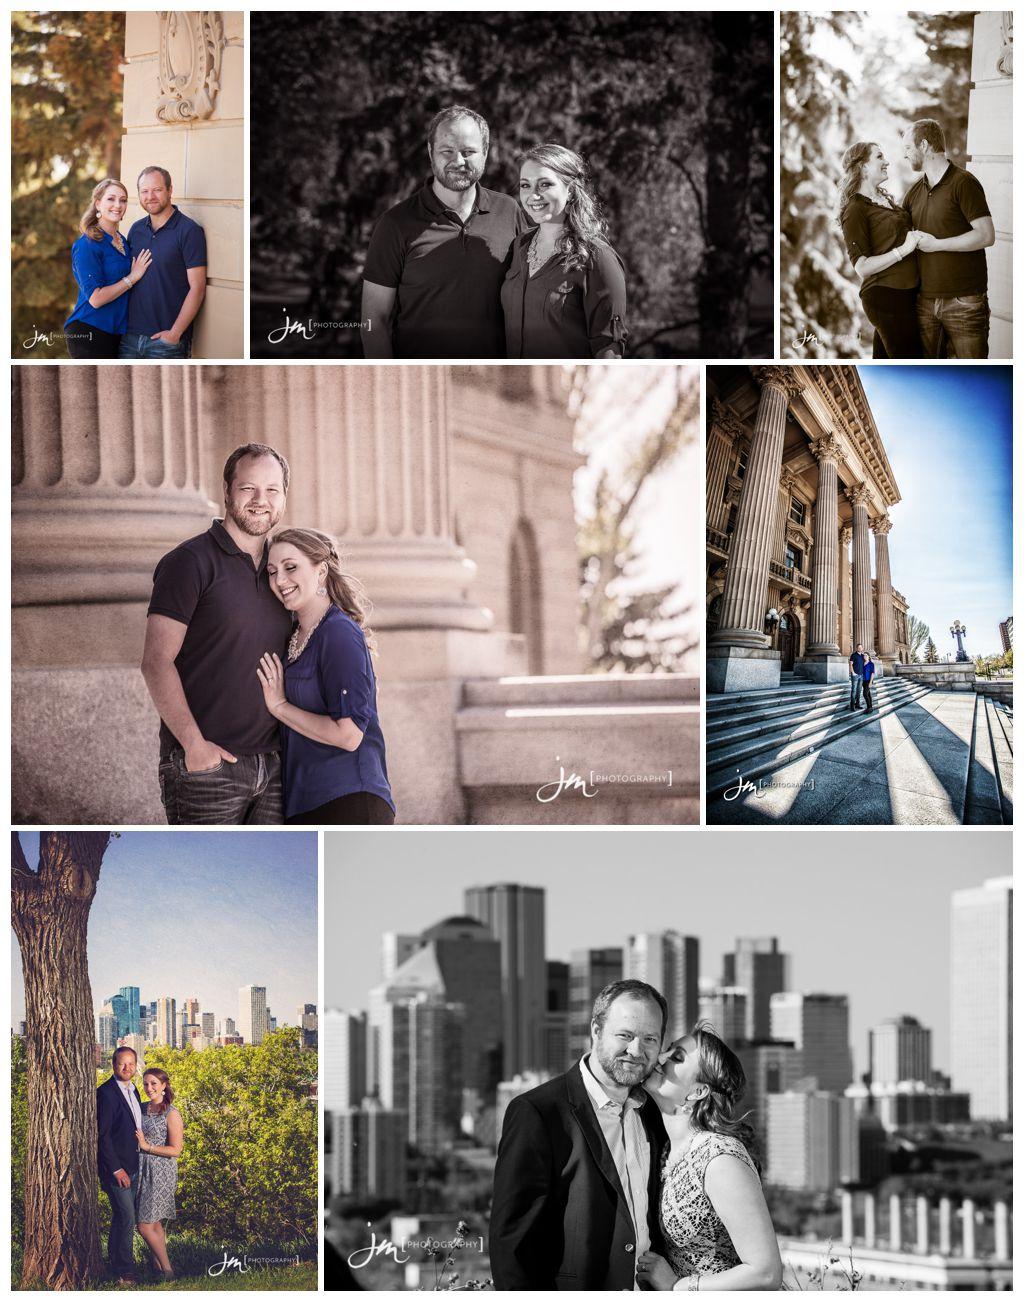 150518_235-Engagement-Photos-Edmonton-JM_Photography-Jeremy-Martel-Alberta-Legislature-Building